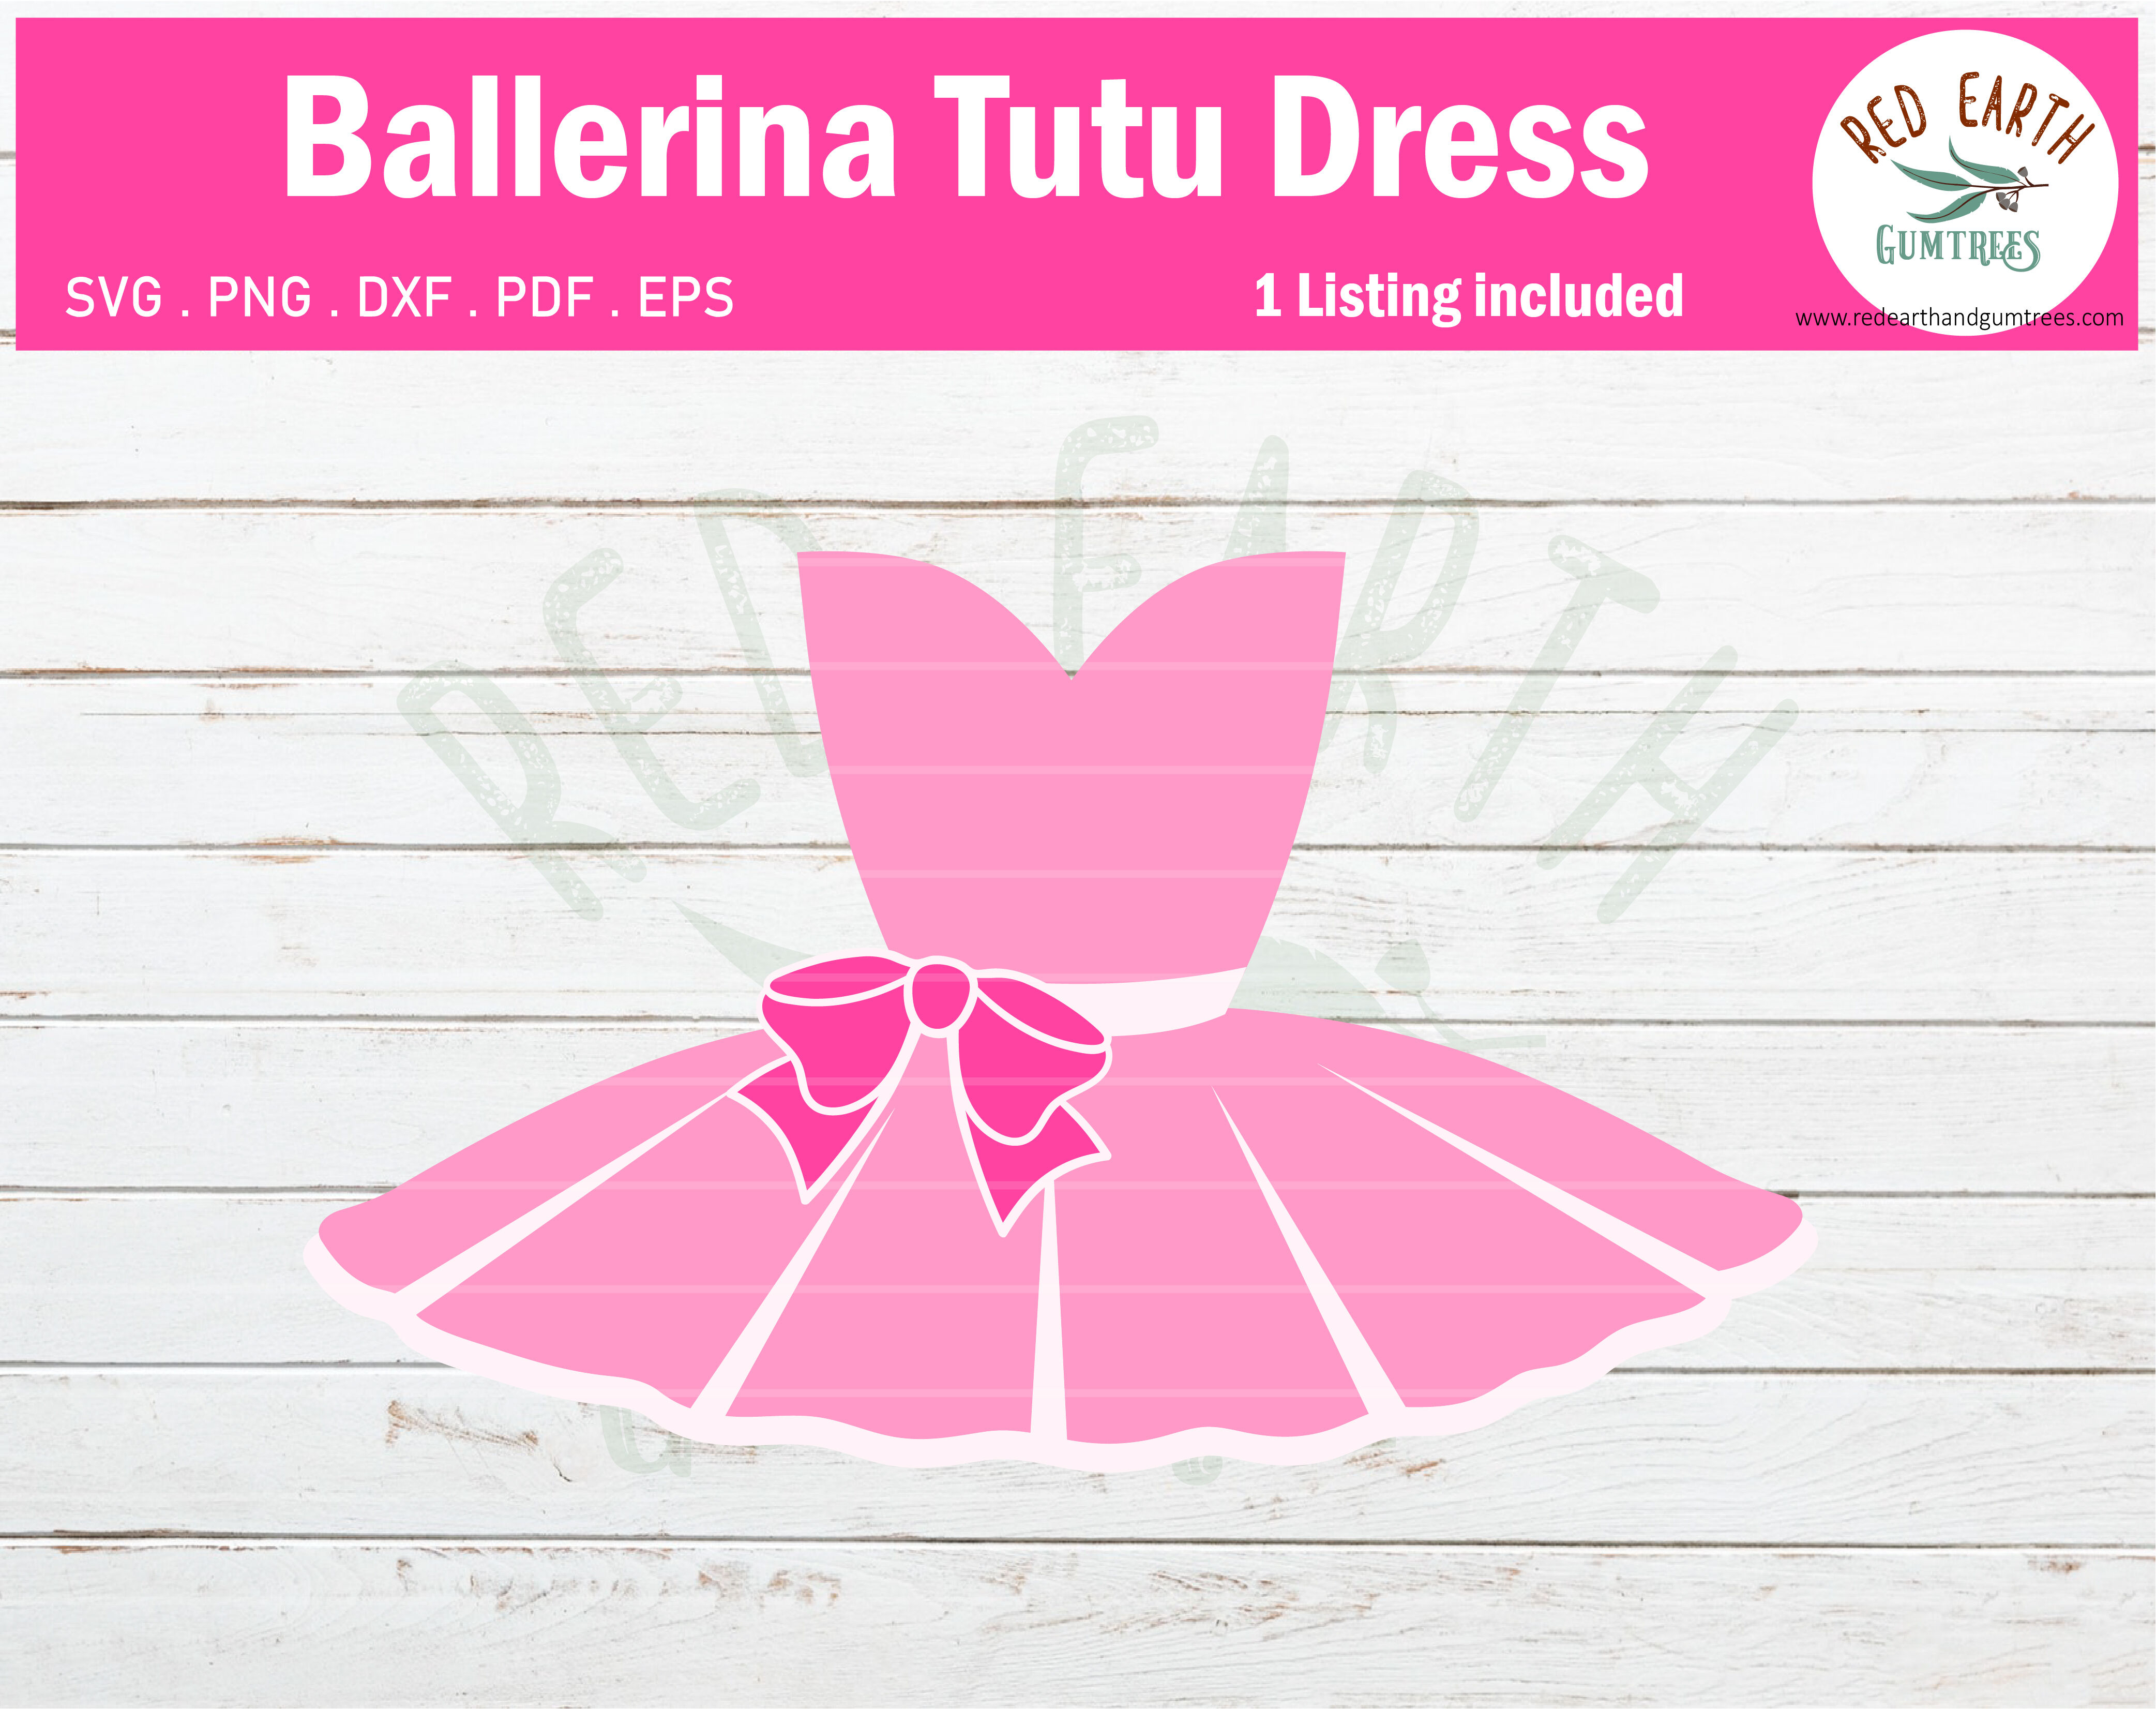 Ballerina Tutu Dress Ballet Tutu Dancing Dress Svg Png Dxf Pdf